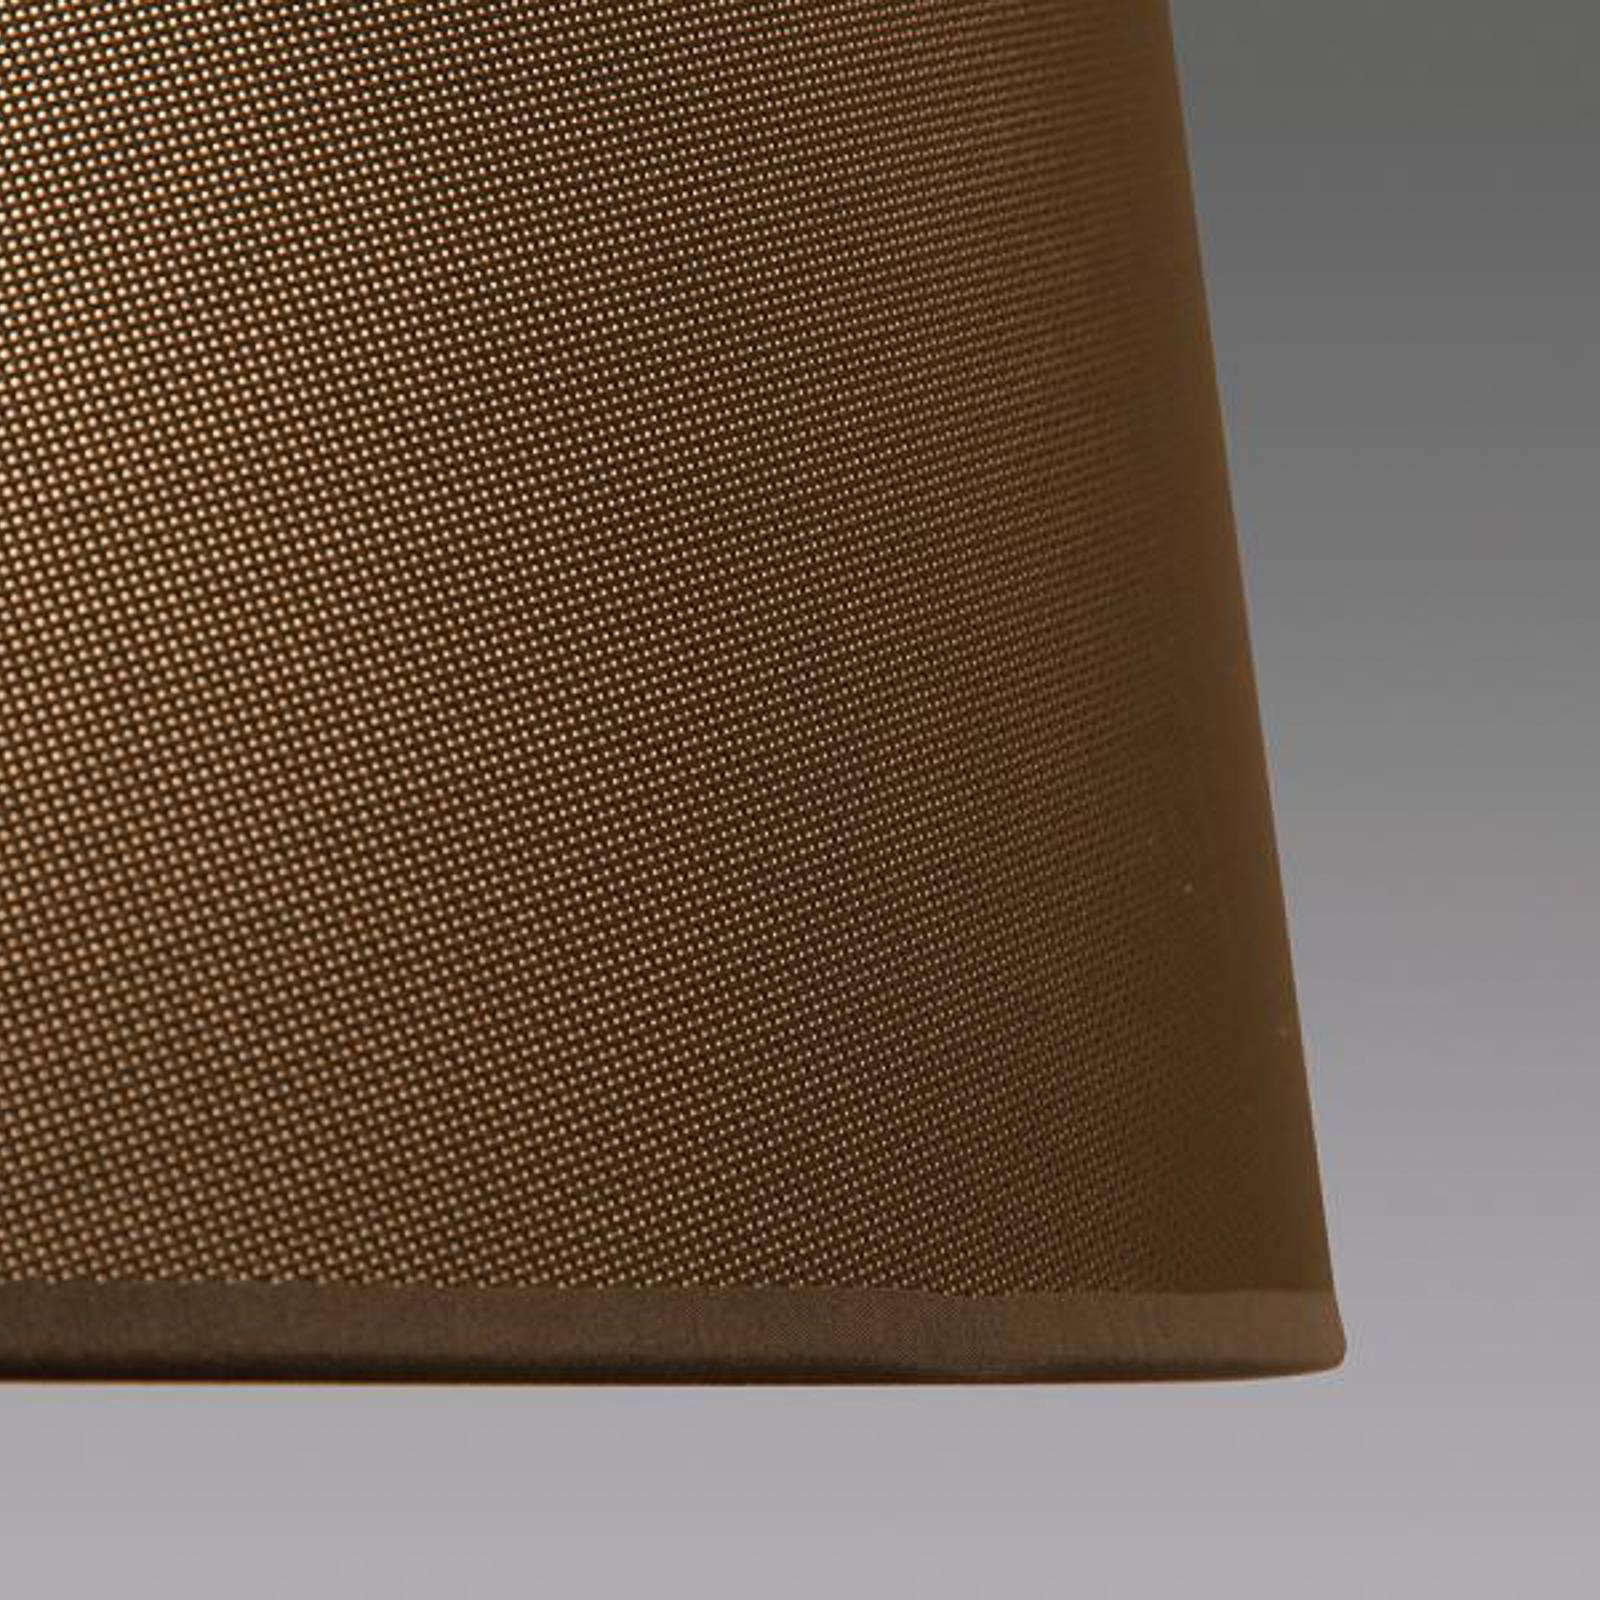 LOUM Bivio M-lattiavalo, 146 cm, Ø 50 cm, ruskea